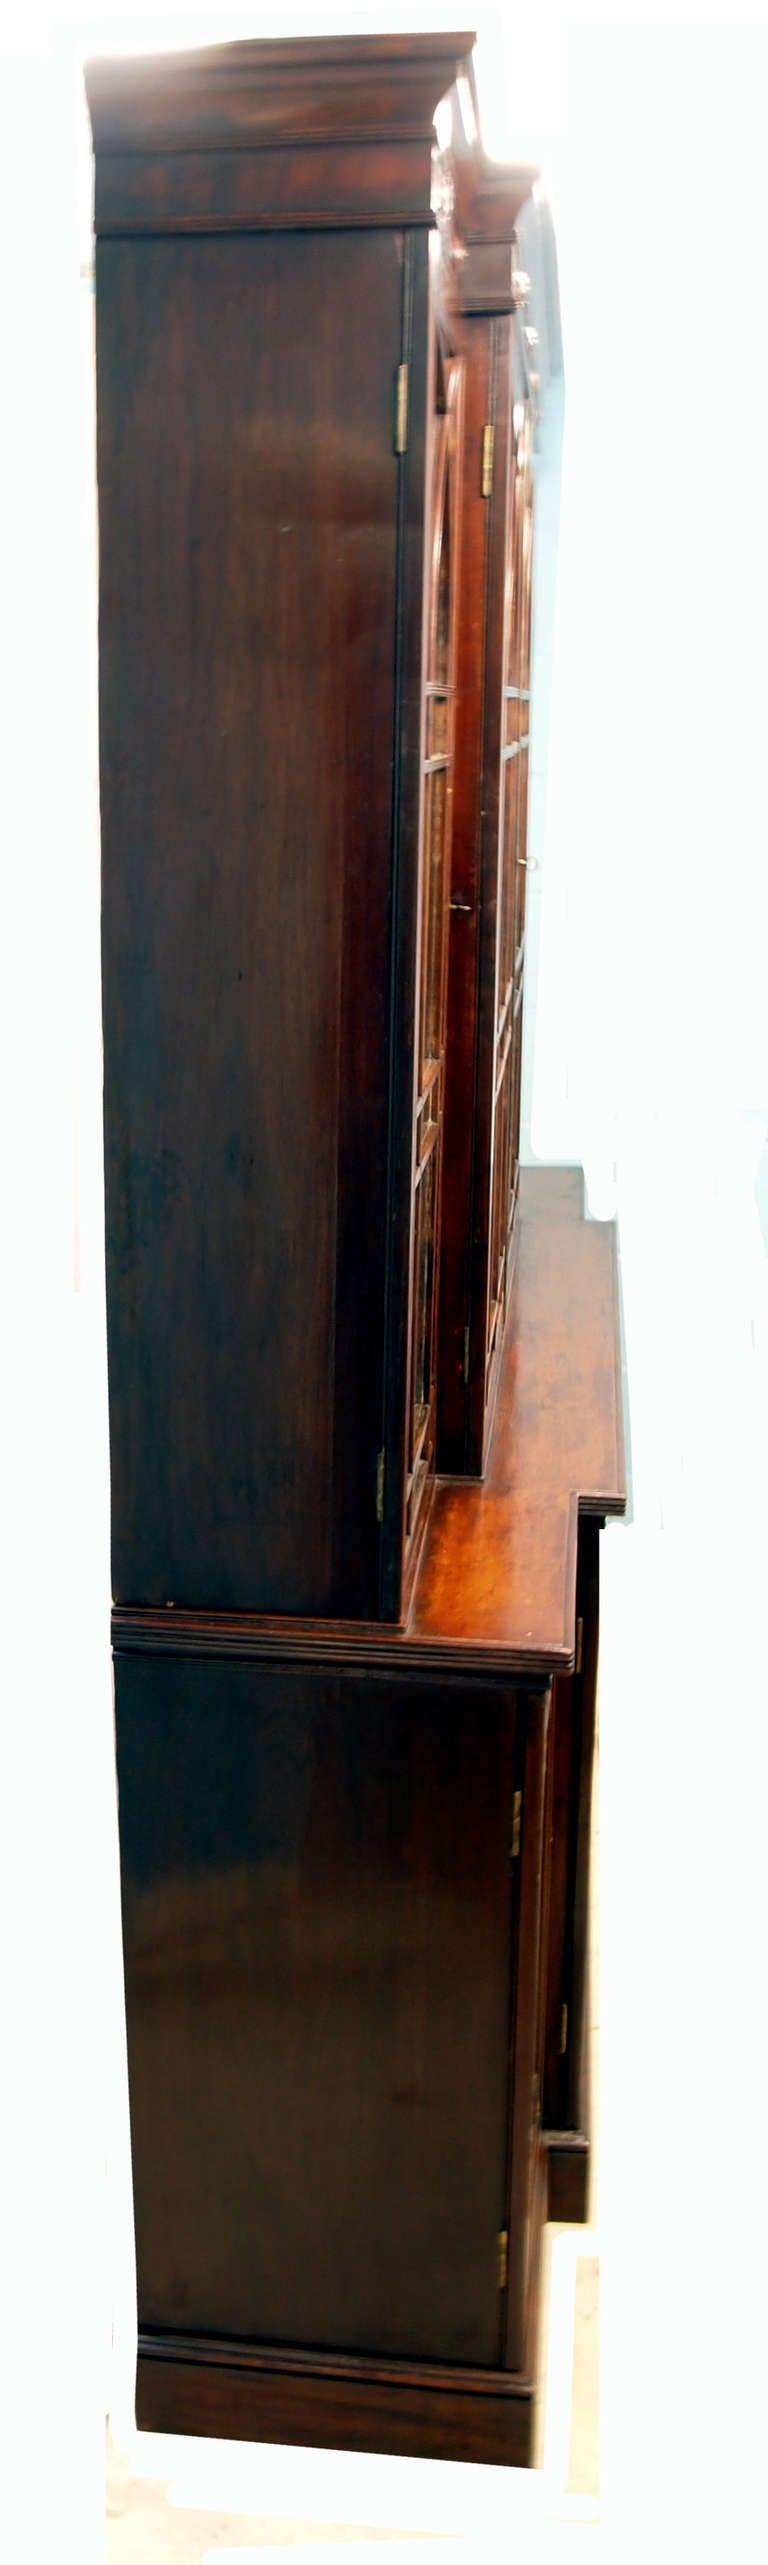 Antique Georgian Mahogany Breakfront Bookcase  3